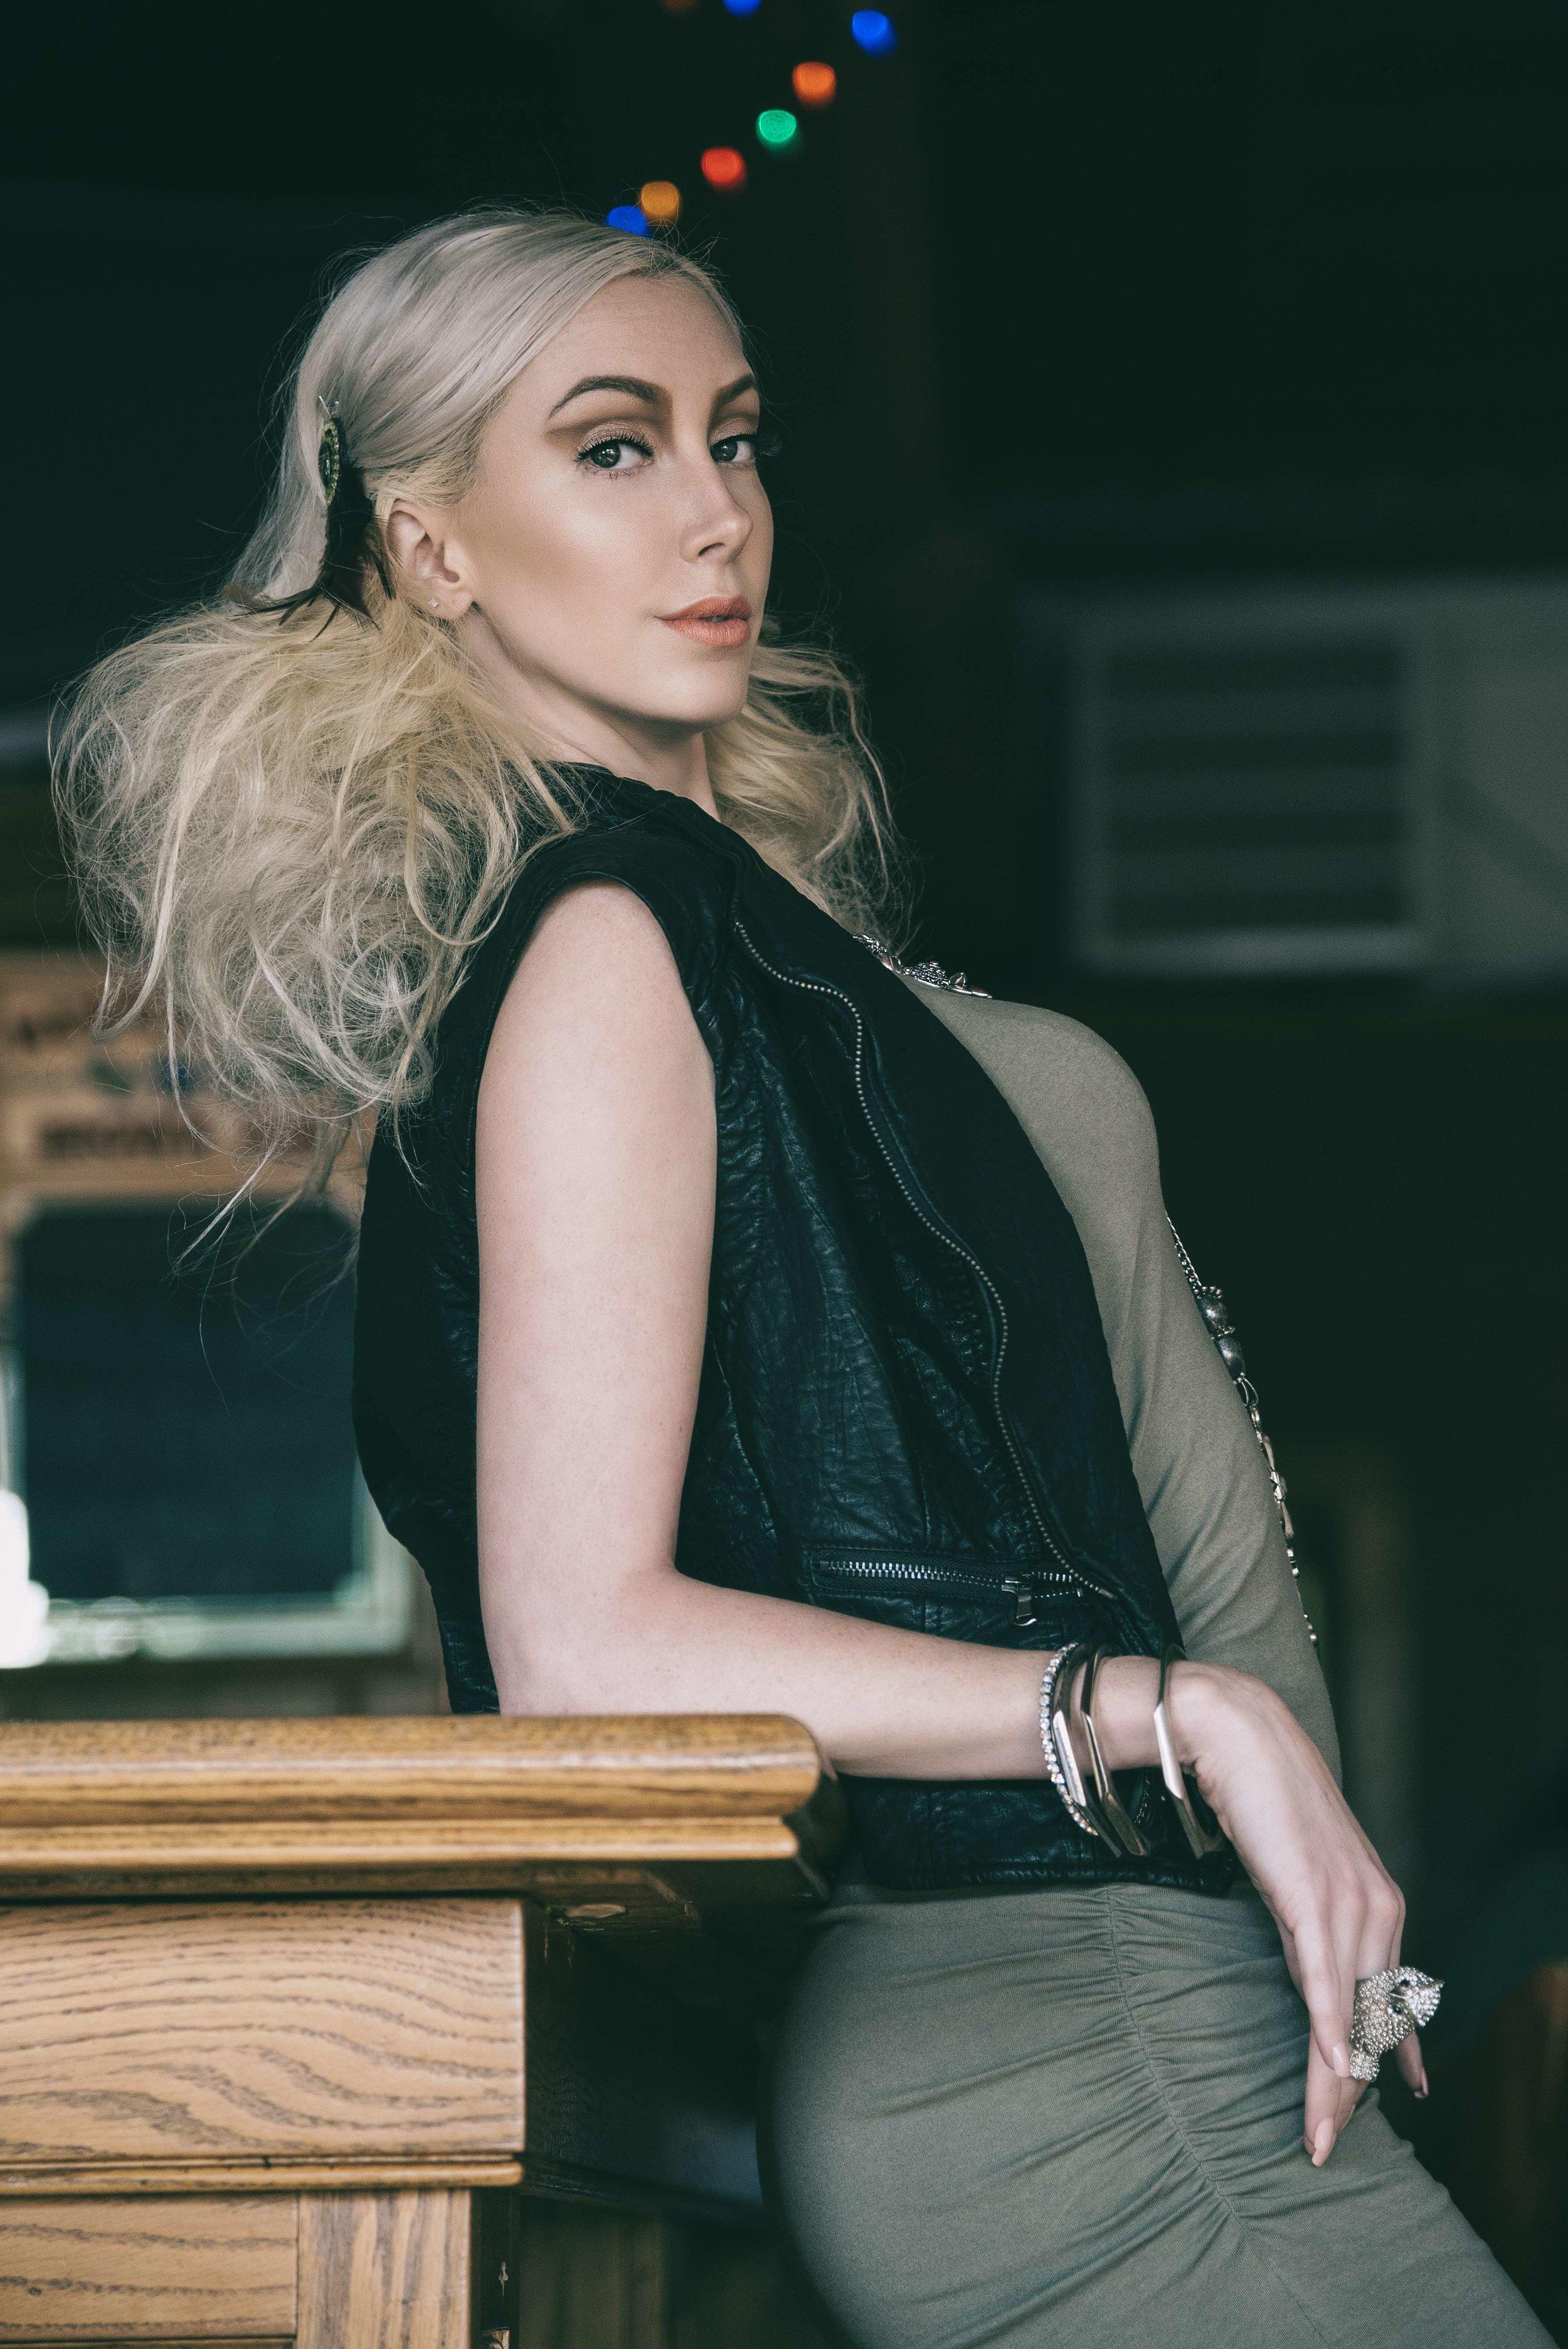 Cocktail Hour '16 - Pump Magazine April 2016 Model Raeven Tibbs